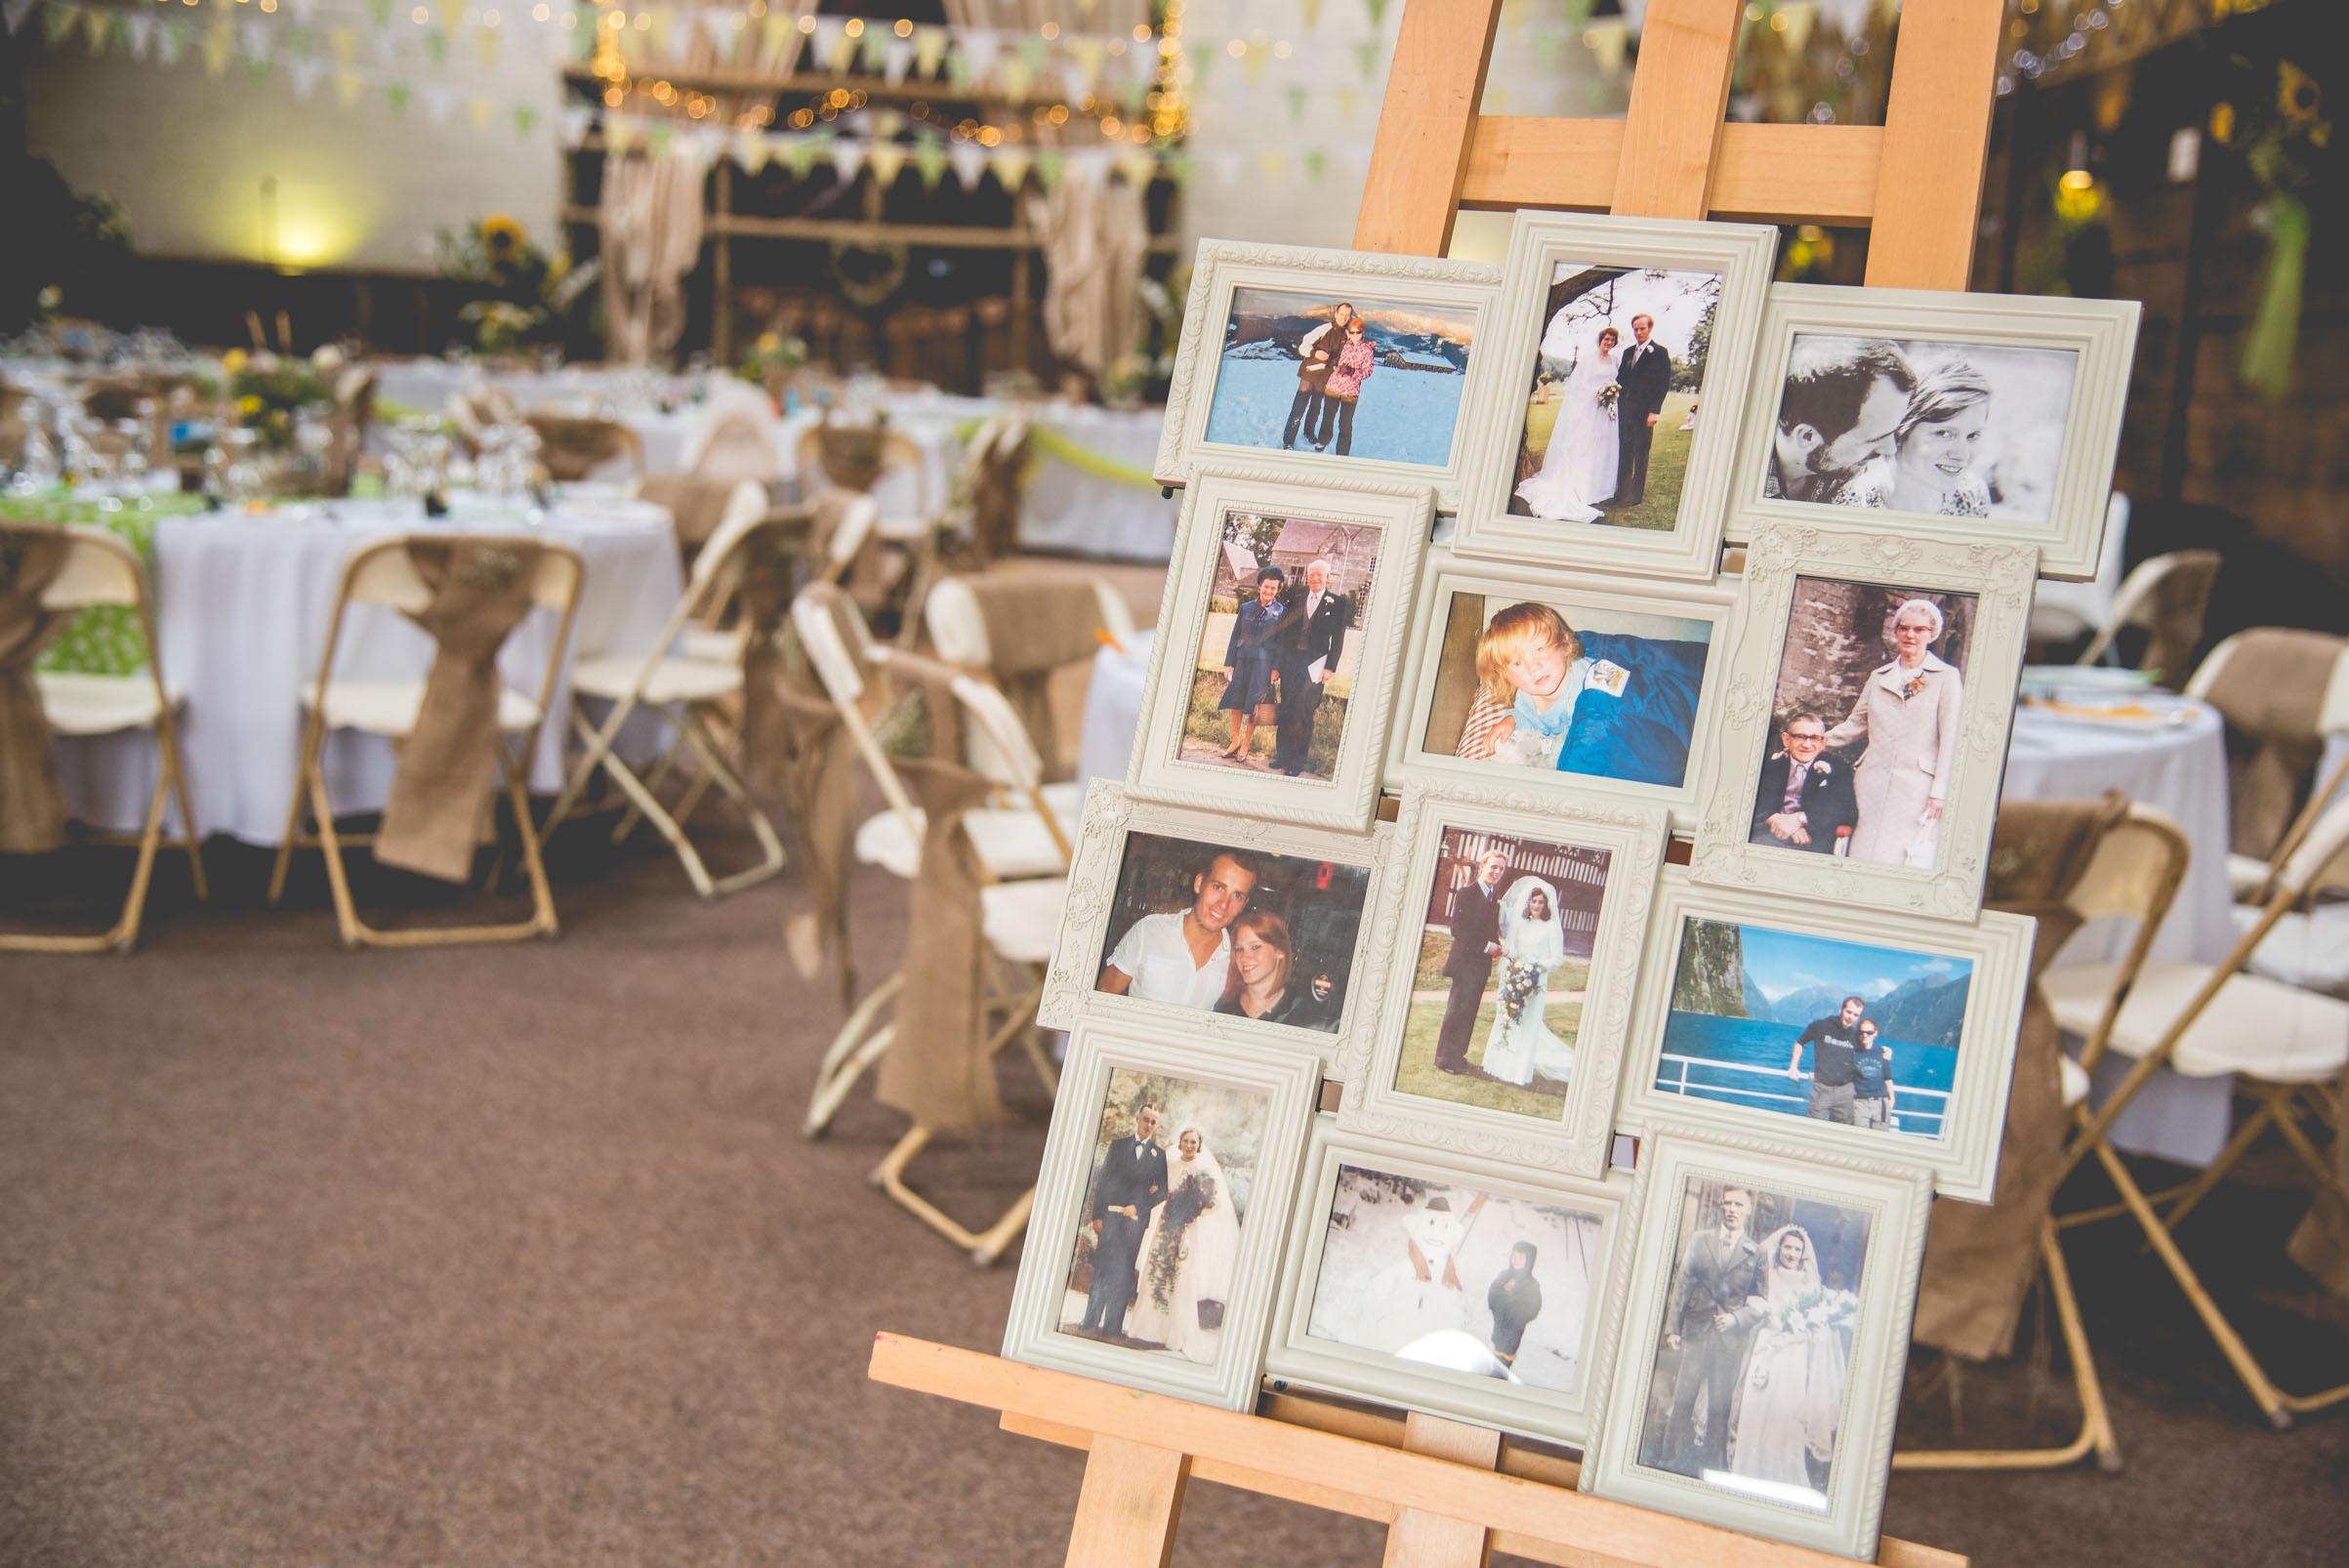 Peak+district+farm+wedding+lower+damgate+photographer-14.jpg